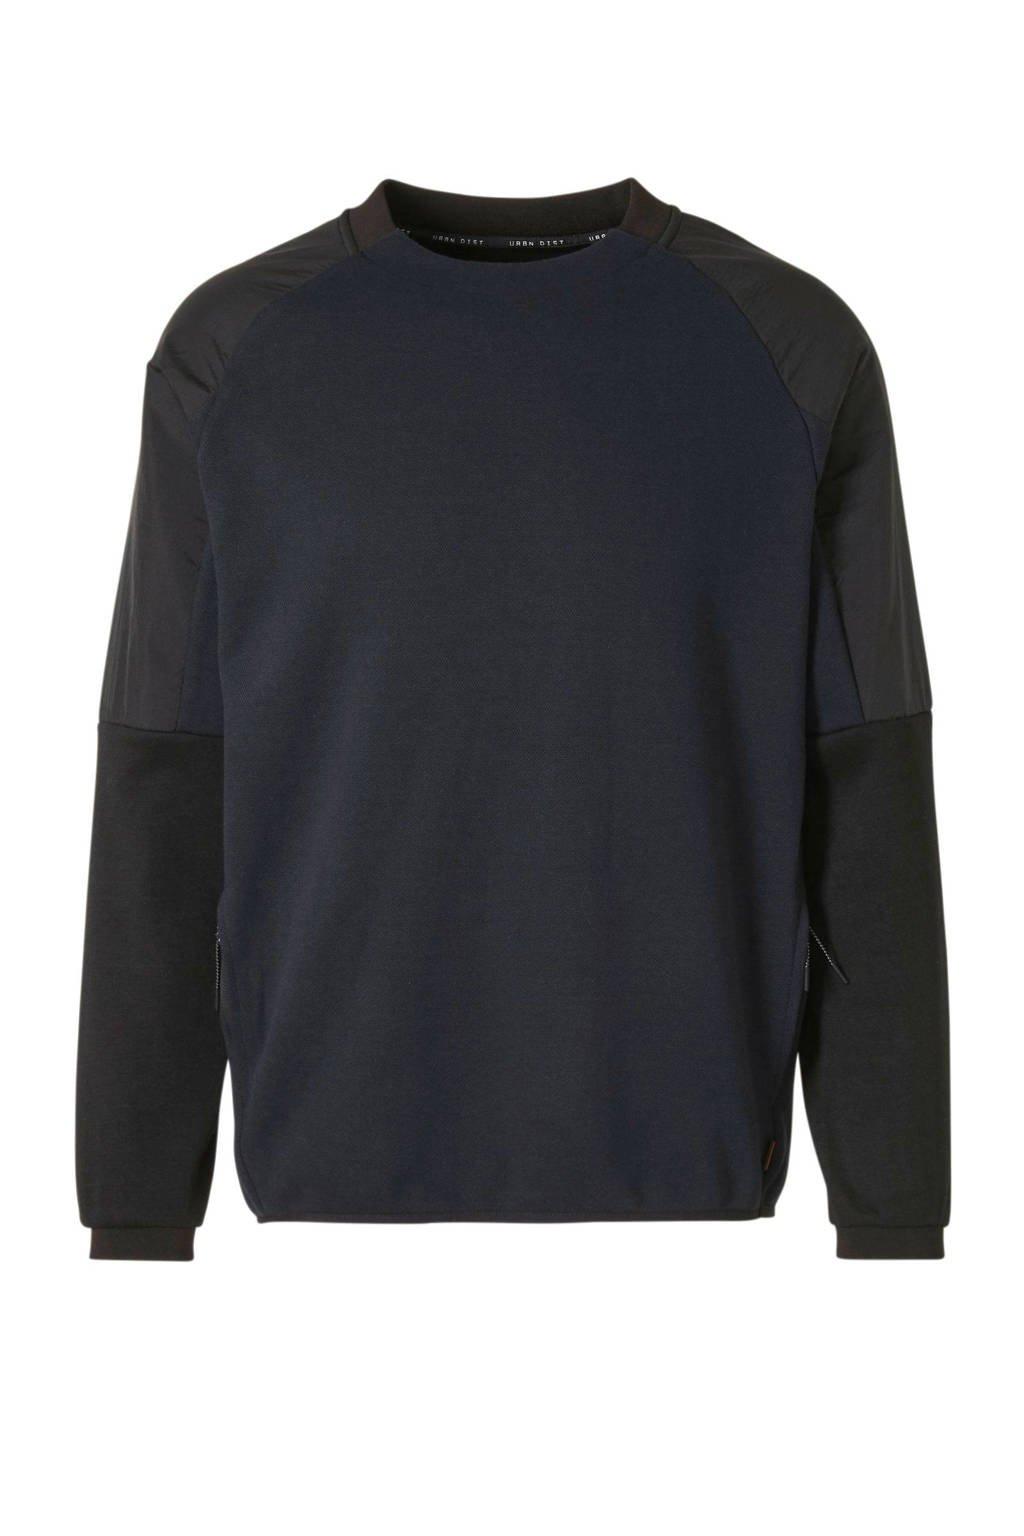 C&A Angelo Litrico sweater cosmicnavy, CosmicNavy